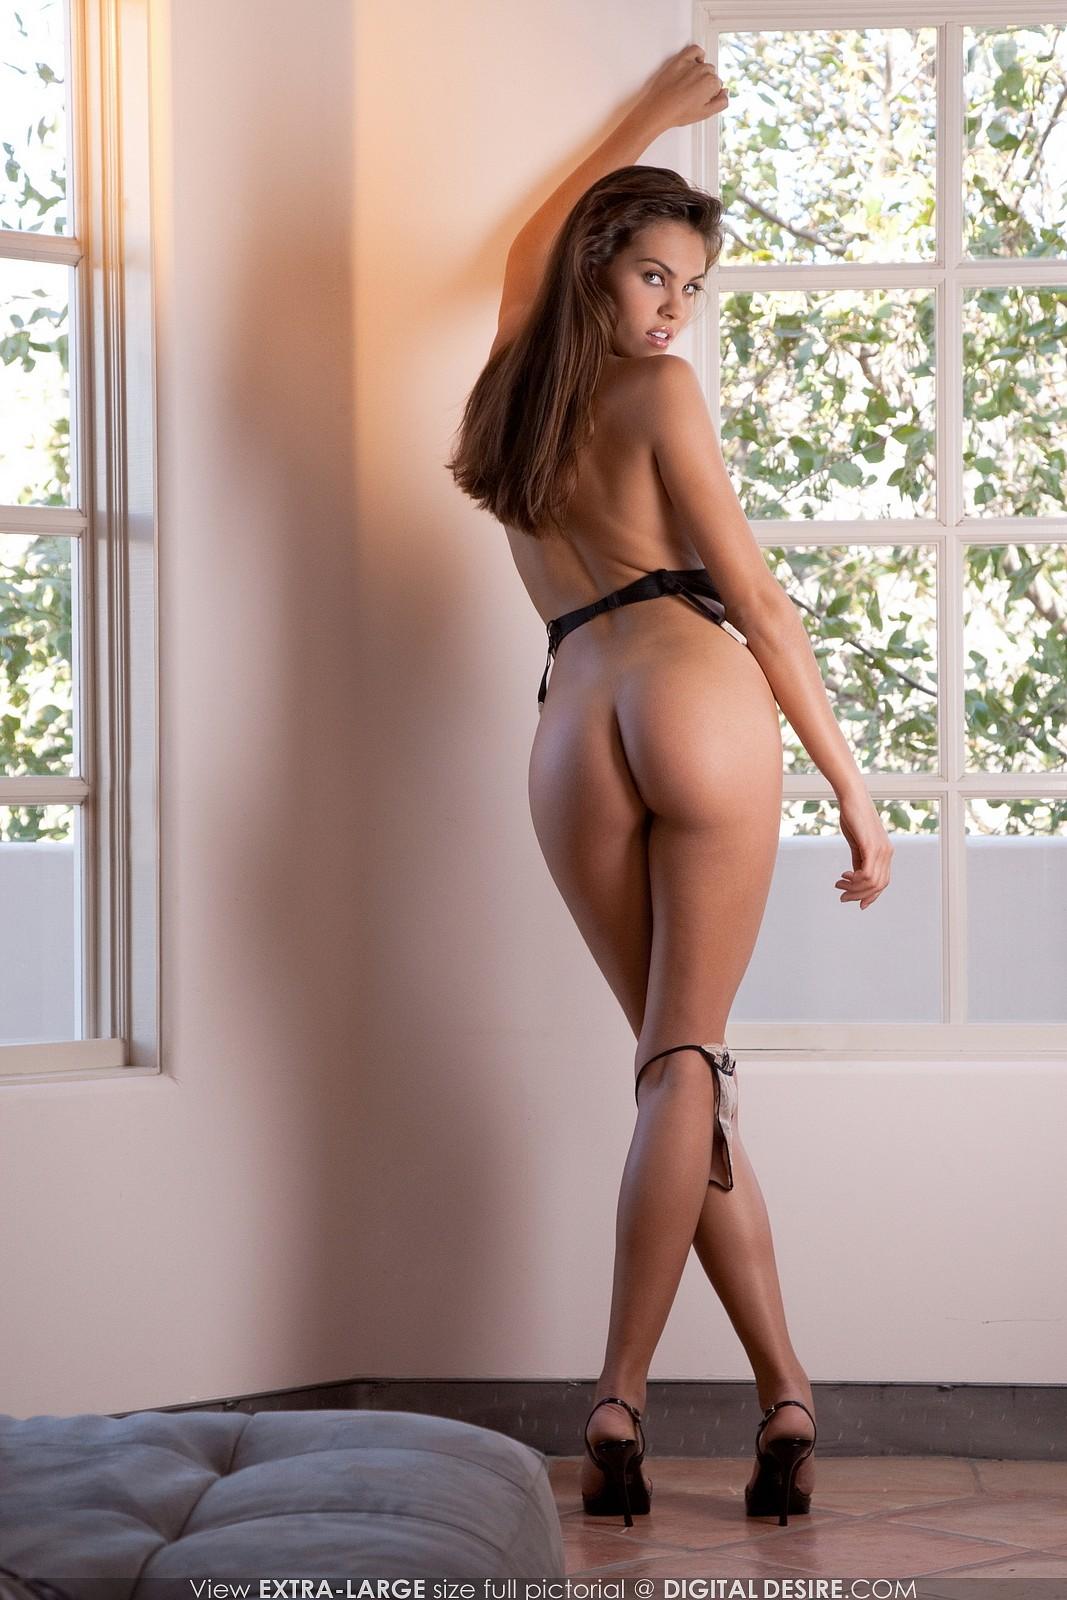 Victoria Valmer Is A Brunette Goddess From France 939-4780